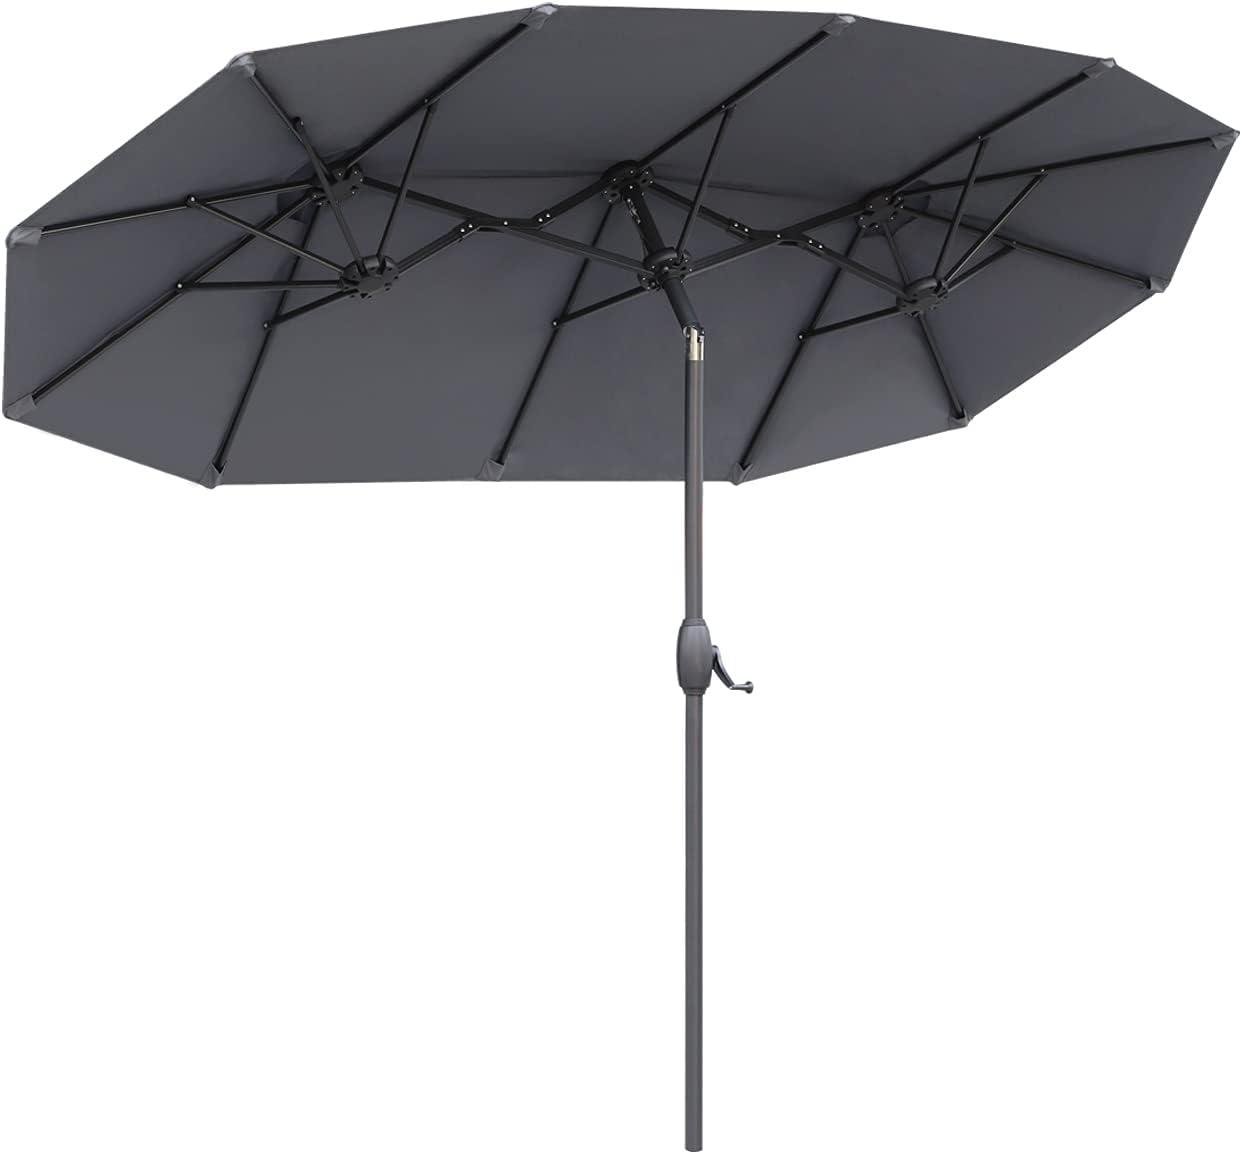 Sekey® 300 cm x 150 cm Sombrilla Parasol de Doble Juego para terraza jardín Playa Piscina Patio diámetro Protector Solar UV50+ Gris